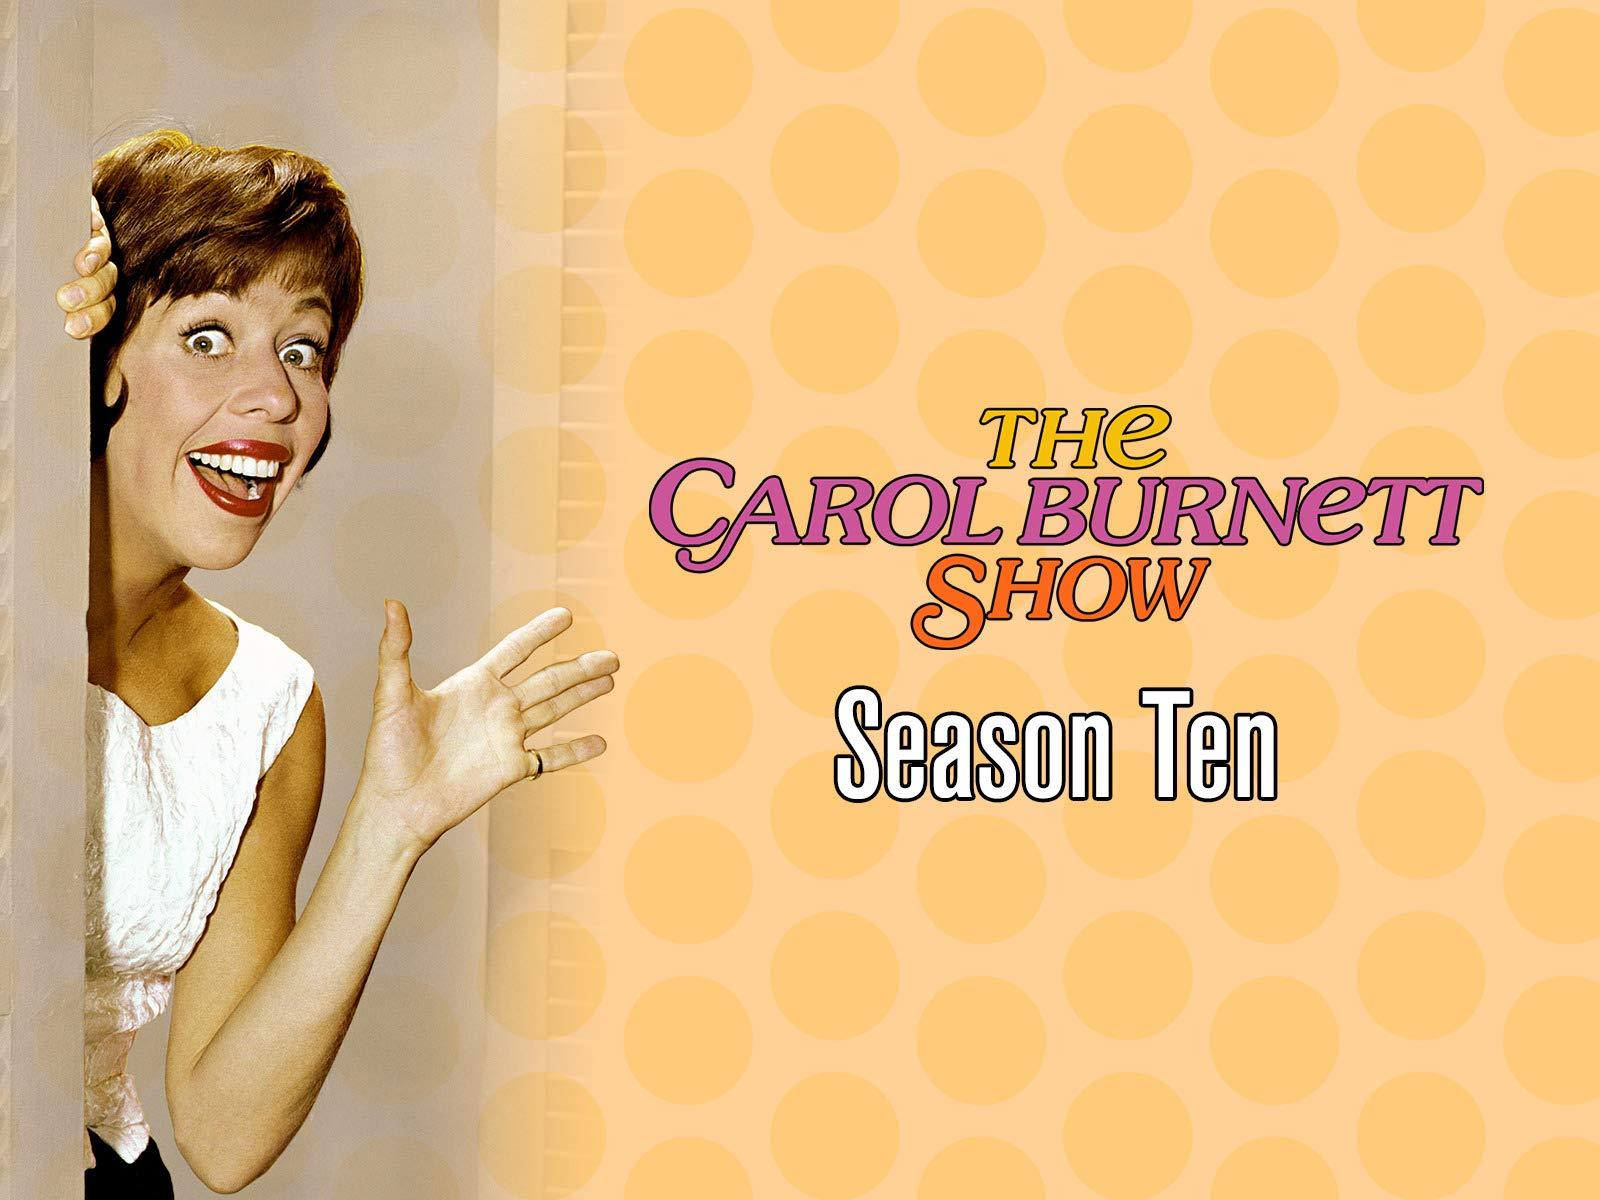 The Carol Burnett Show - Season 10